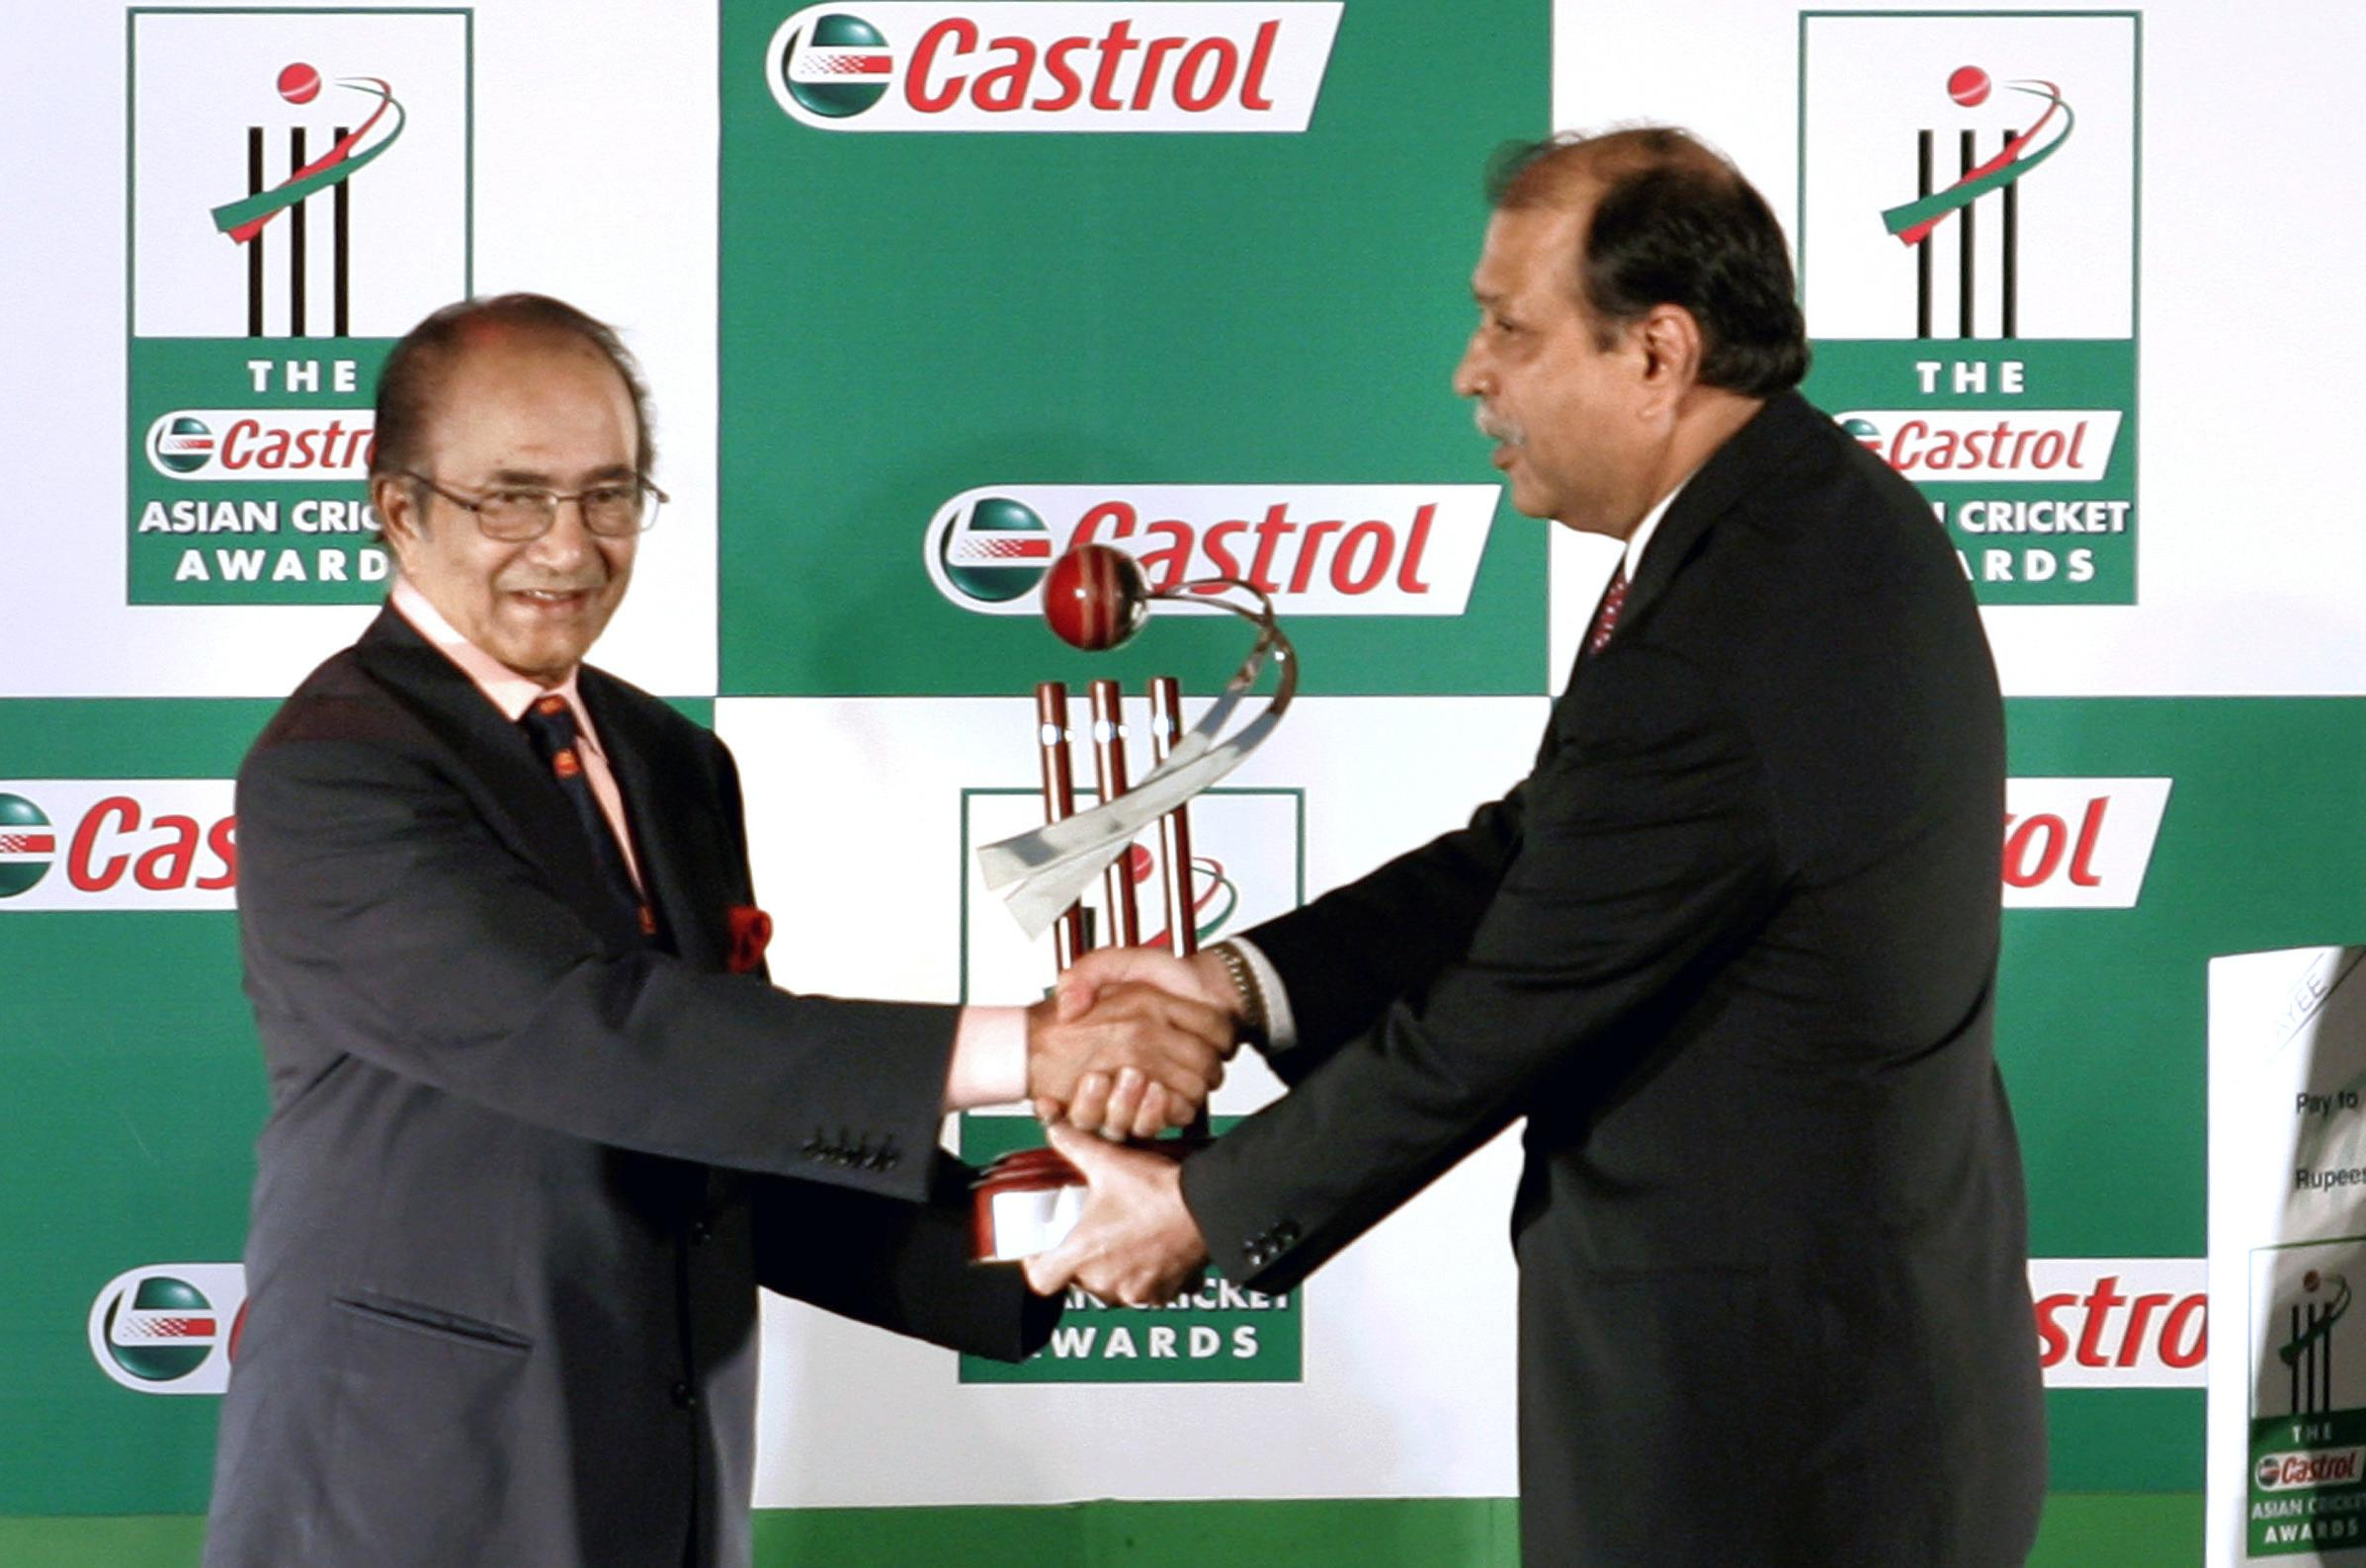 Newmakers: Pakastani cricket legend Hanif Mohammad dies